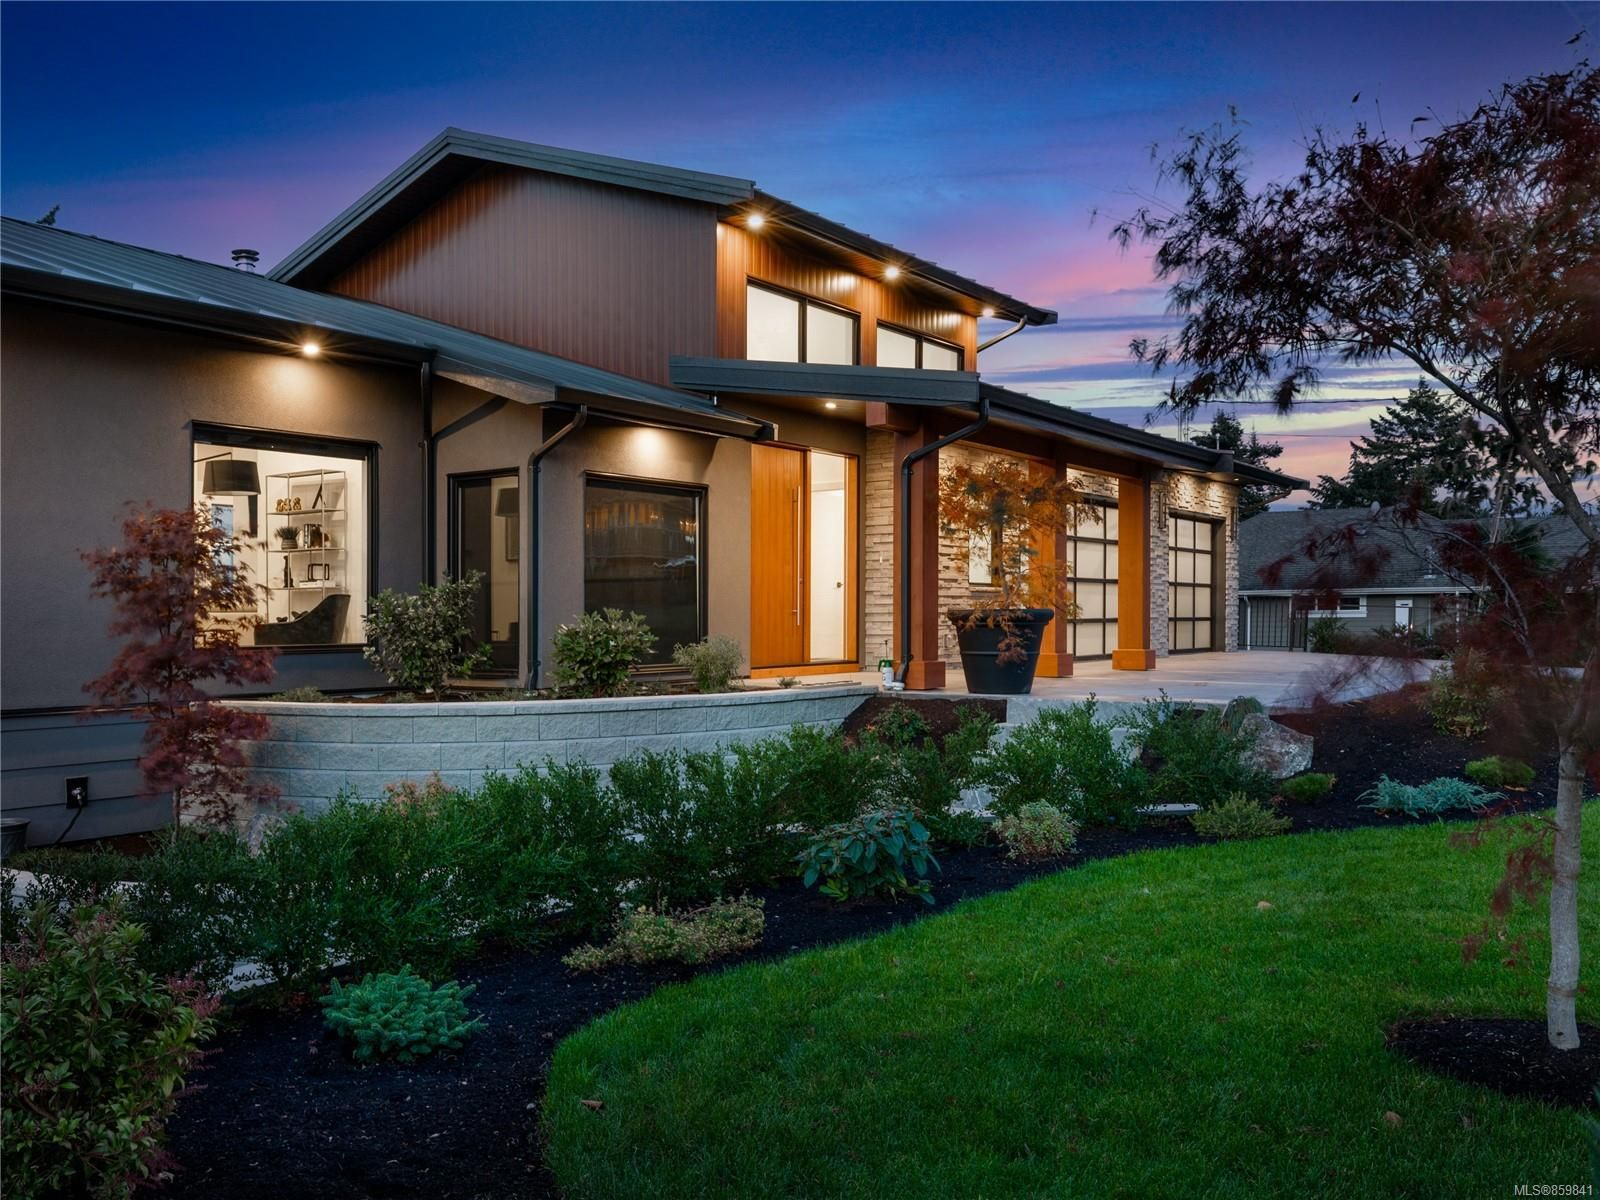 Main Photo: 5460 Bayshore Dr in : Na North Nanaimo House for sale (Nanaimo)  : MLS®# 859841